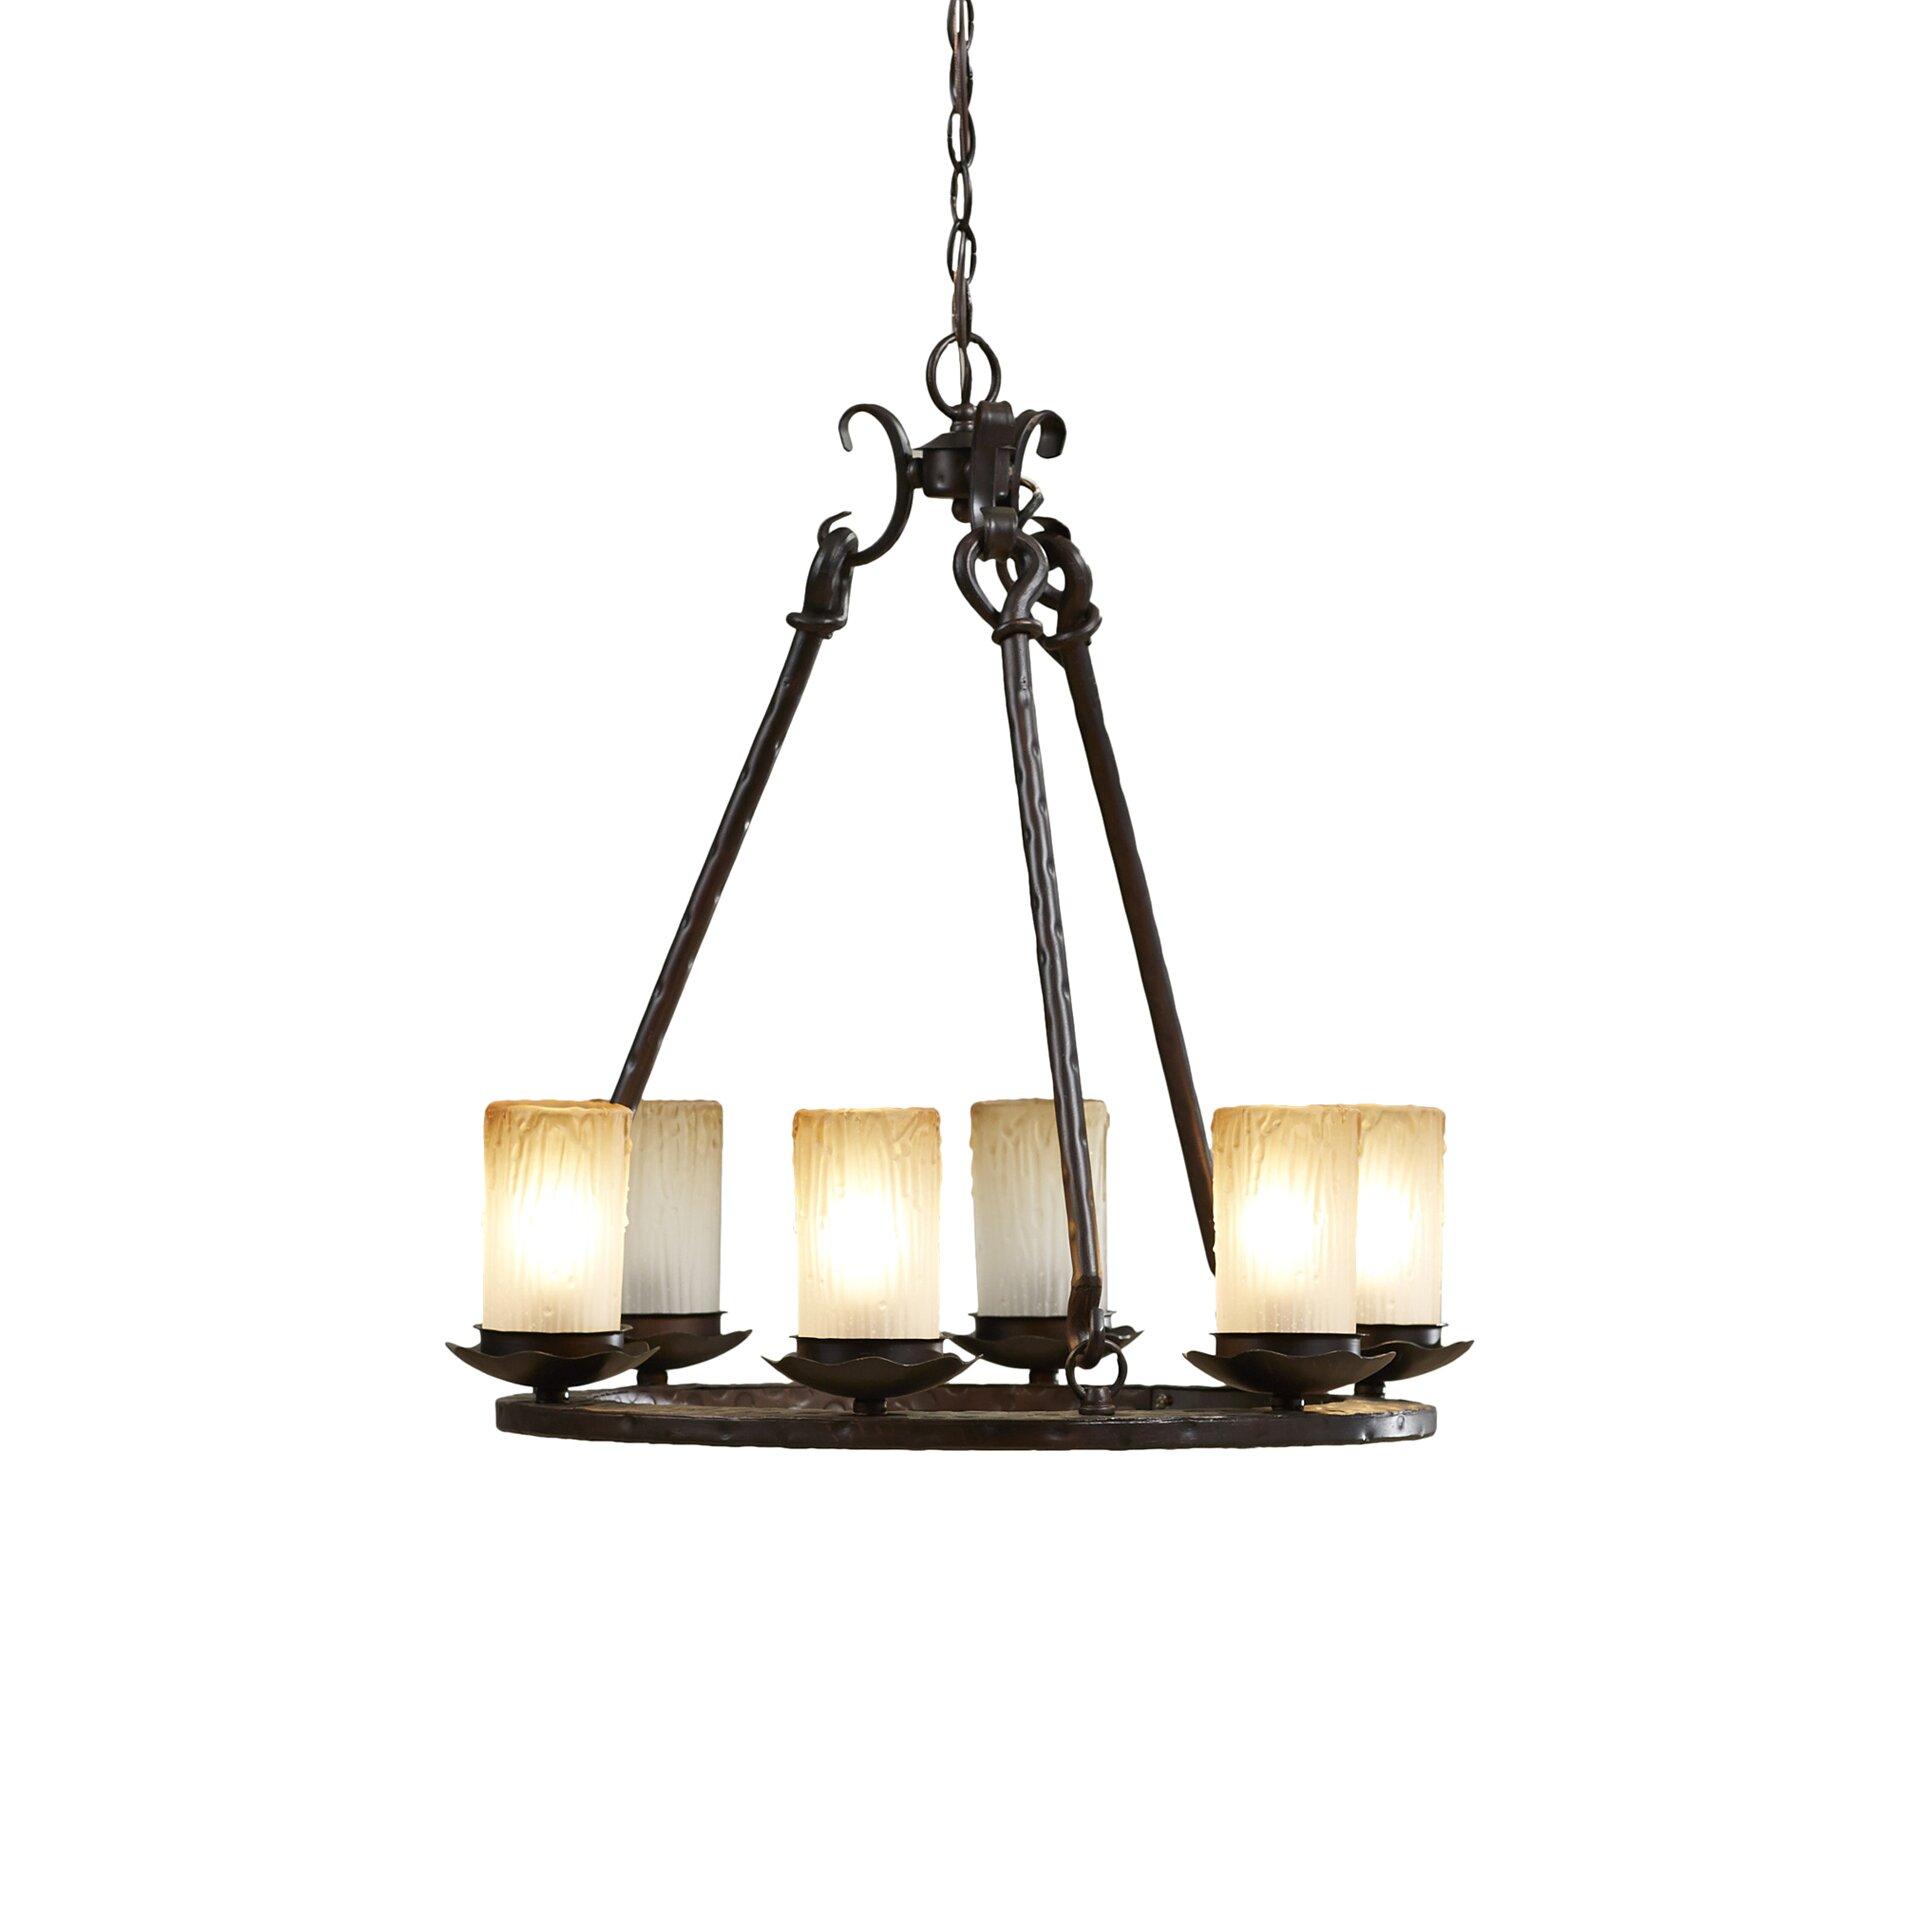 Loon Peak Rowan 6 Light Chandelier & Reviews